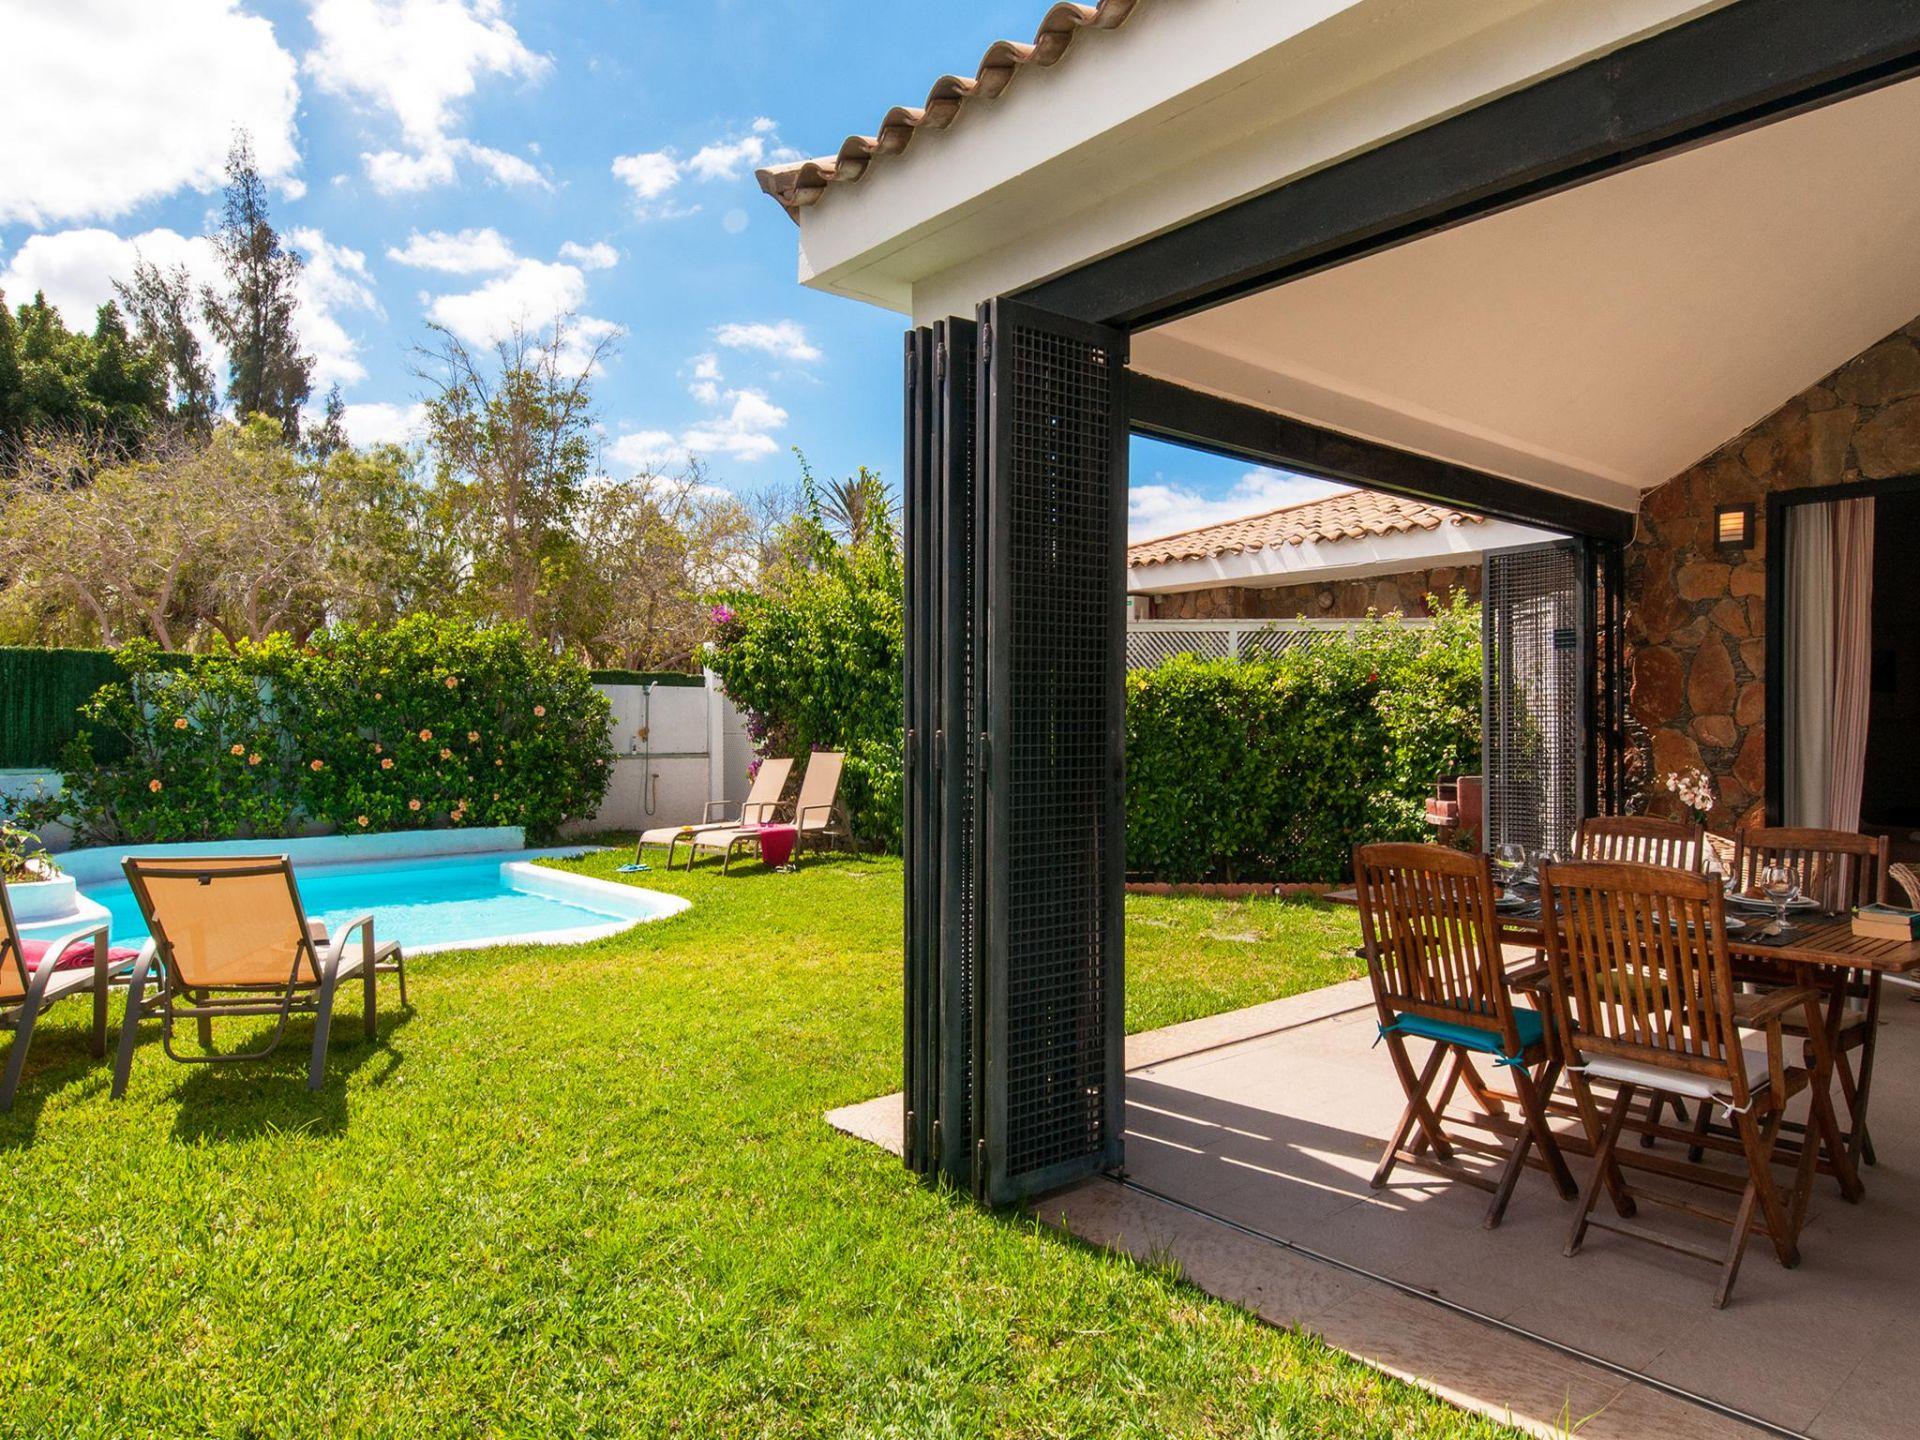 Holiday apartment Villa Maspalomas Golf  VIMA-4 (1119511), Maspalomas, Gran Canaria, Canary Islands, Spain, picture 8